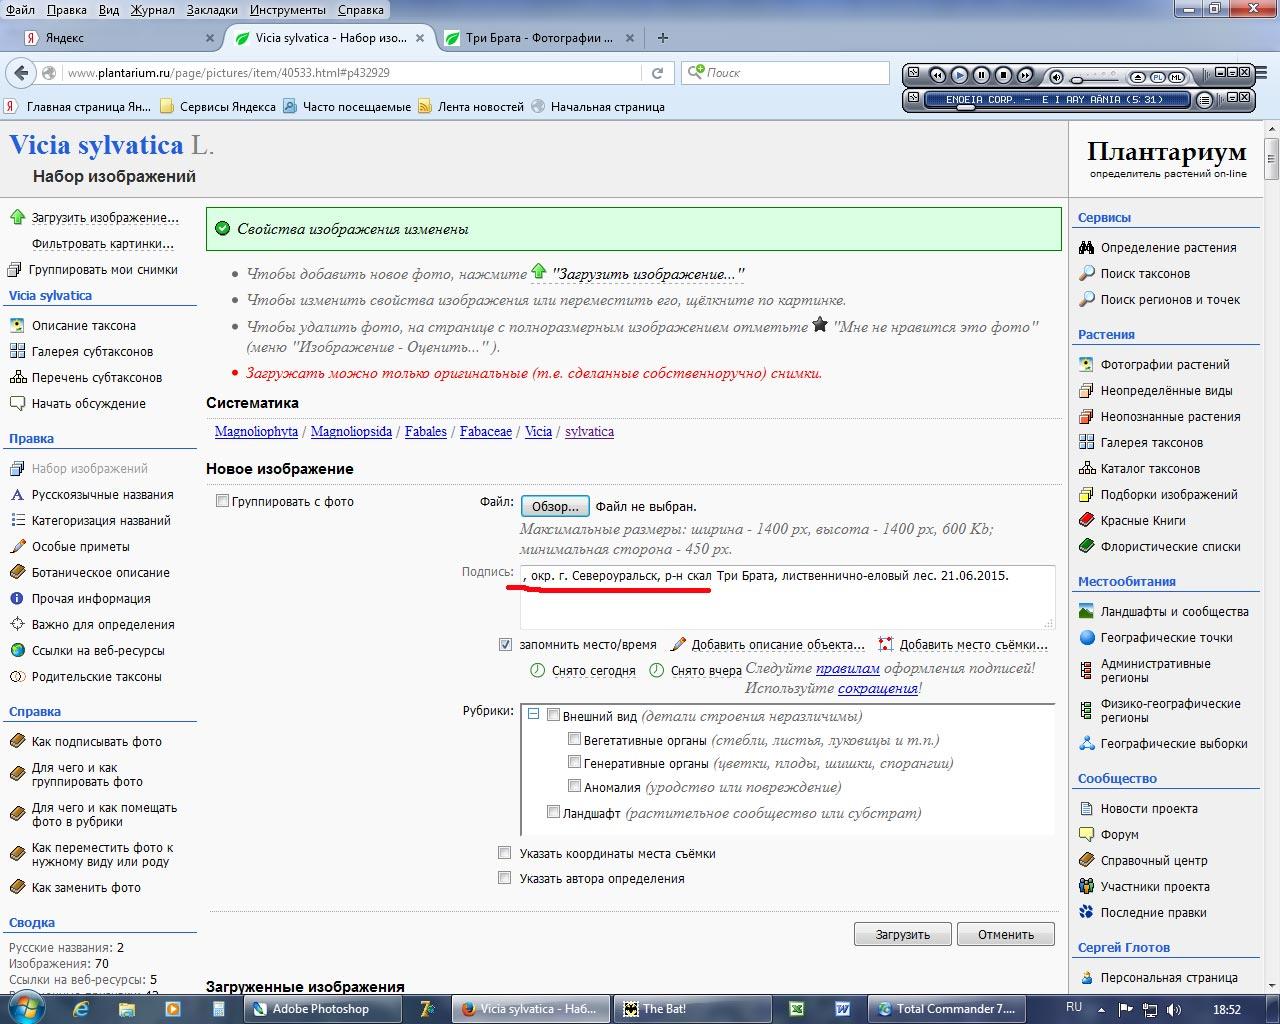 http://forum.plantarium.ru/misc.php?action=pun_attachment&item=8356&download=0